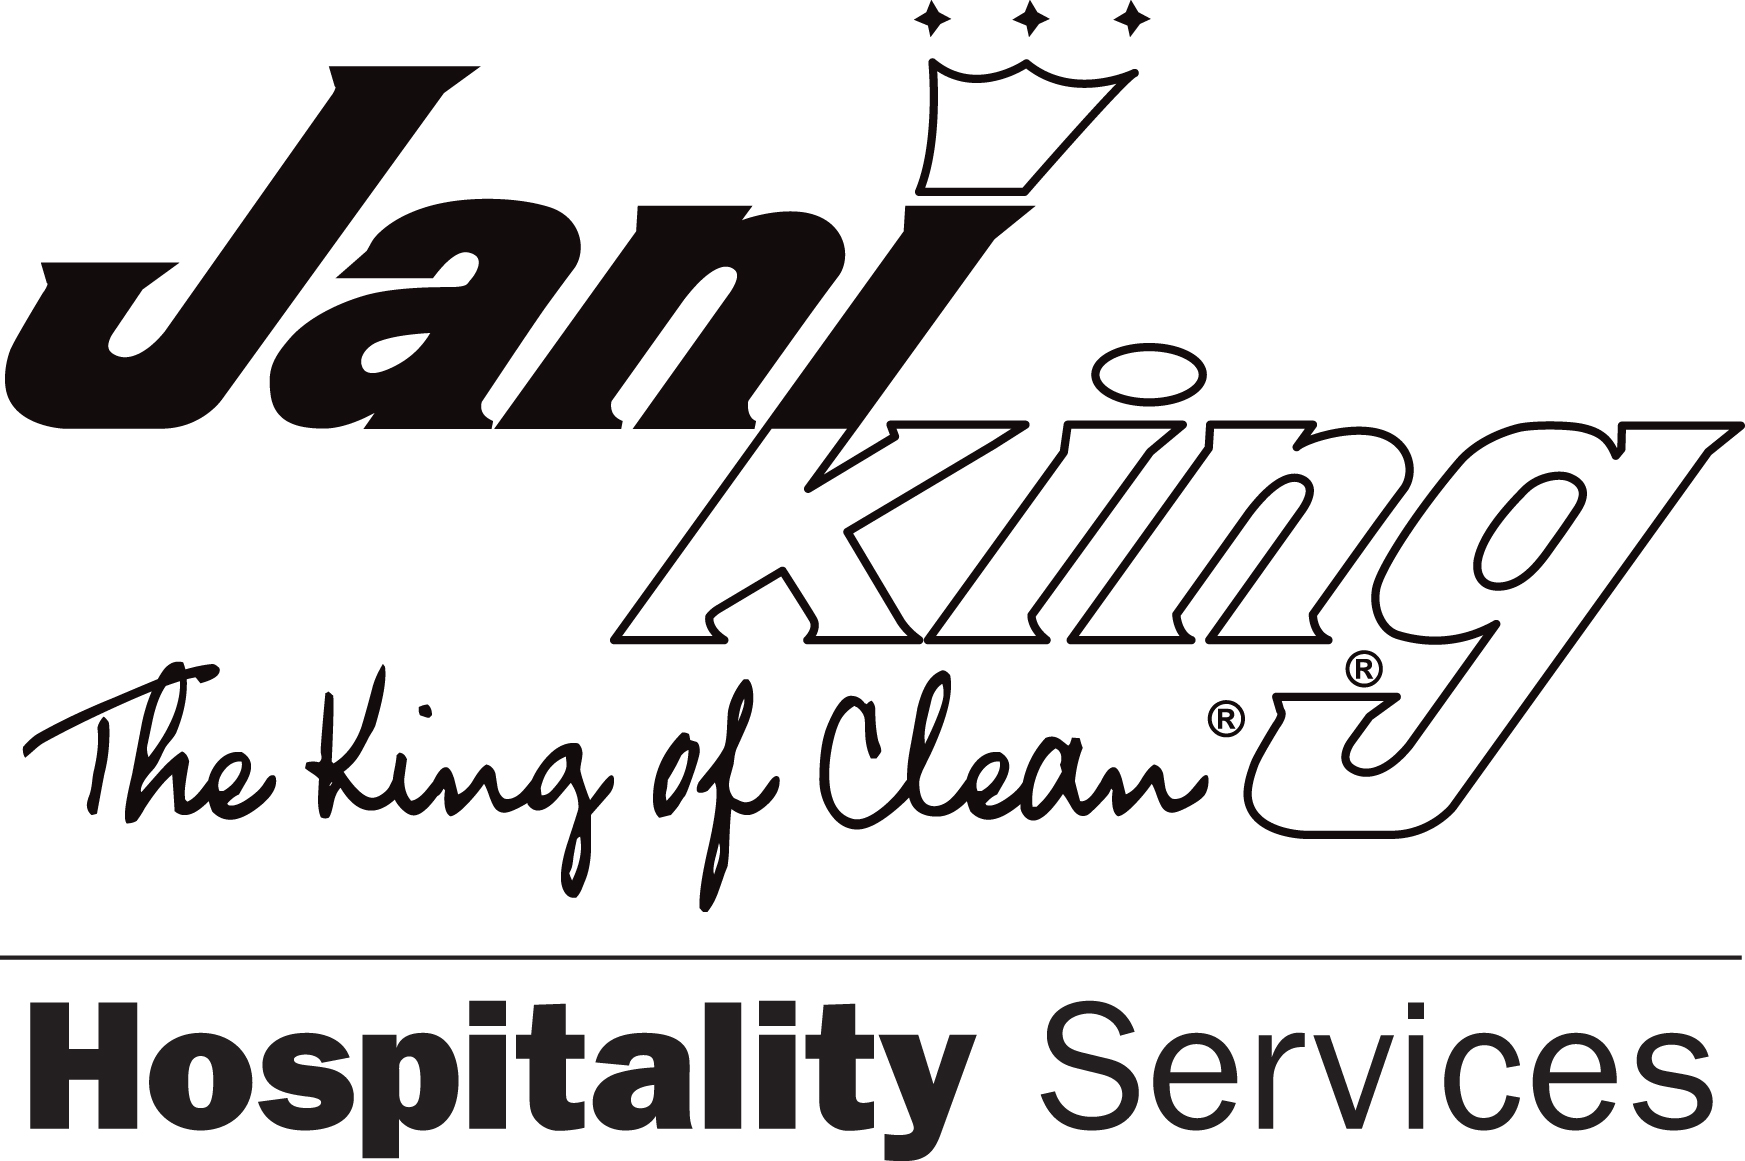 jk_hospitality_services_logo (3).jpg